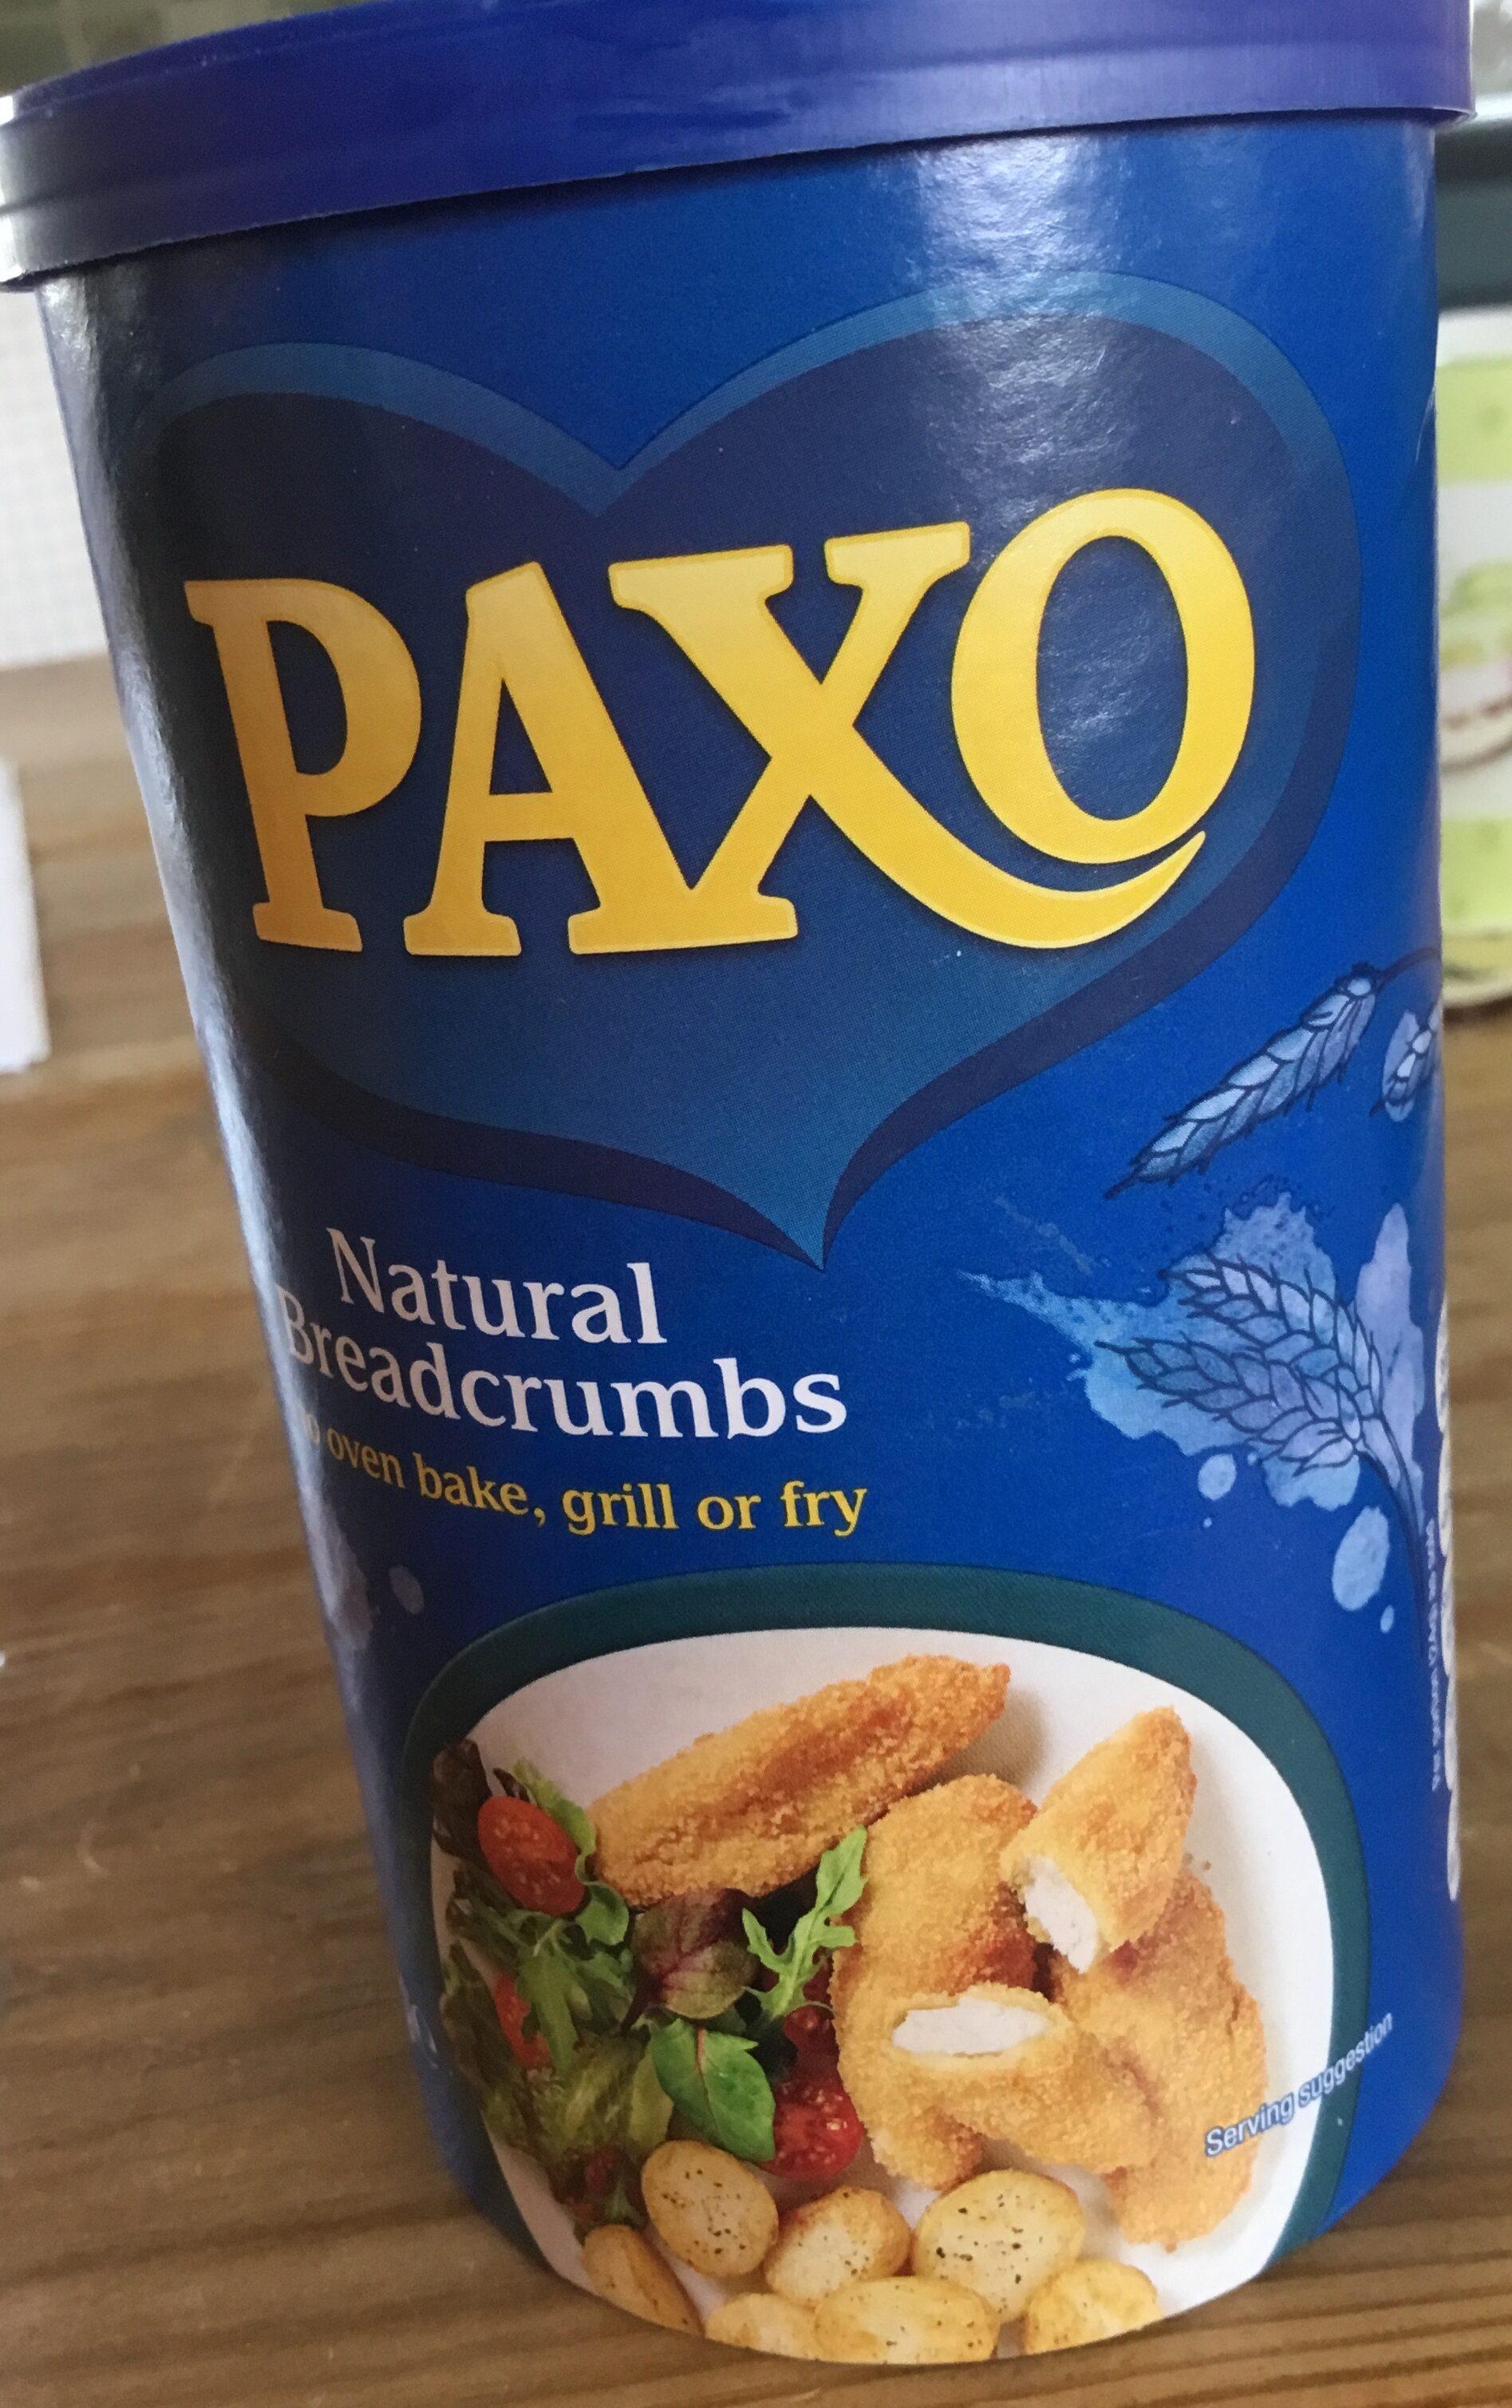 Paxo natural breadcrumbs - Produit - en